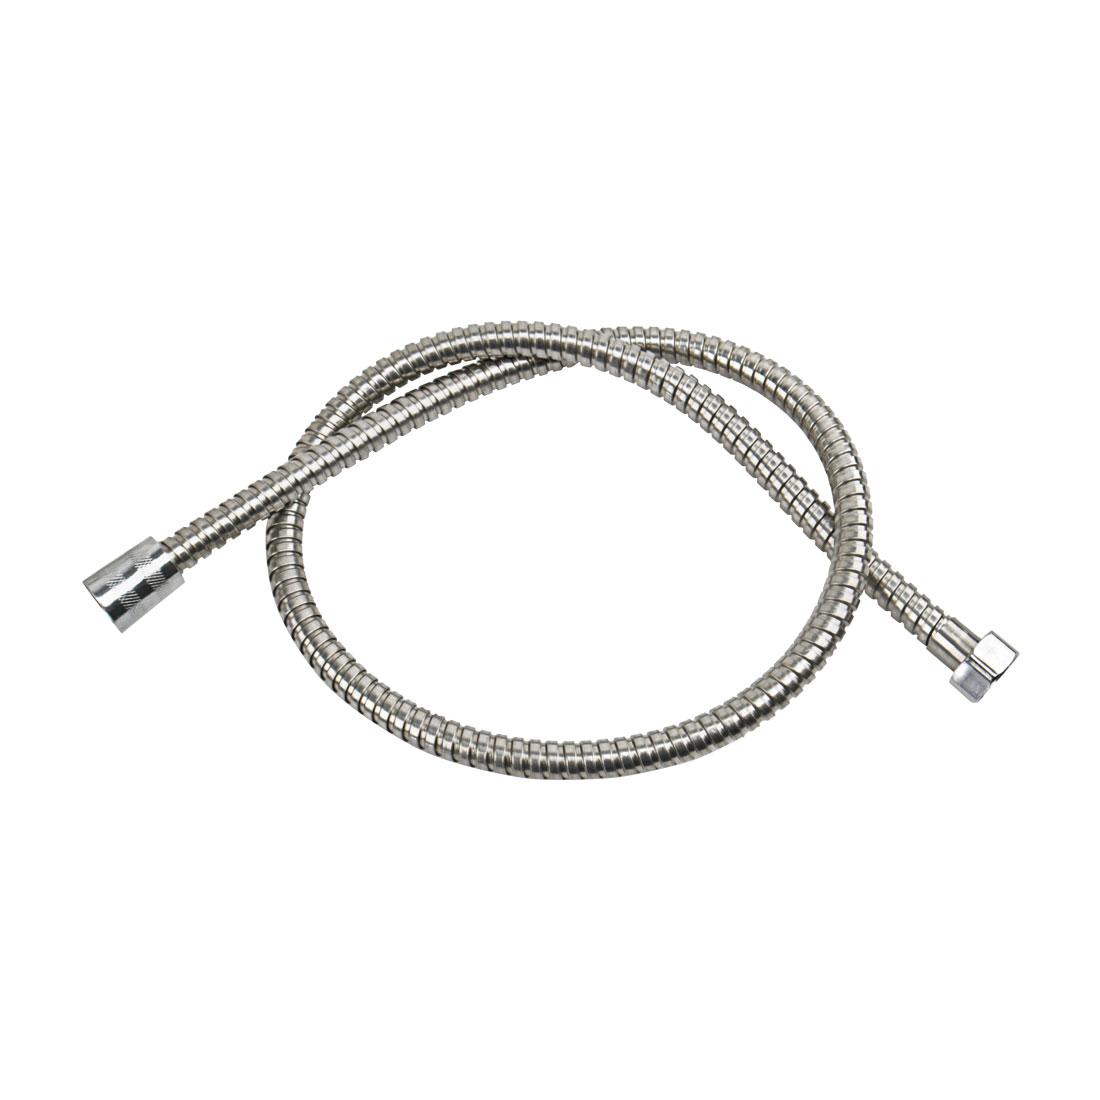 Household Bathroom Metal Spiral Flexible Bathing Shower Hose Pipe 1M